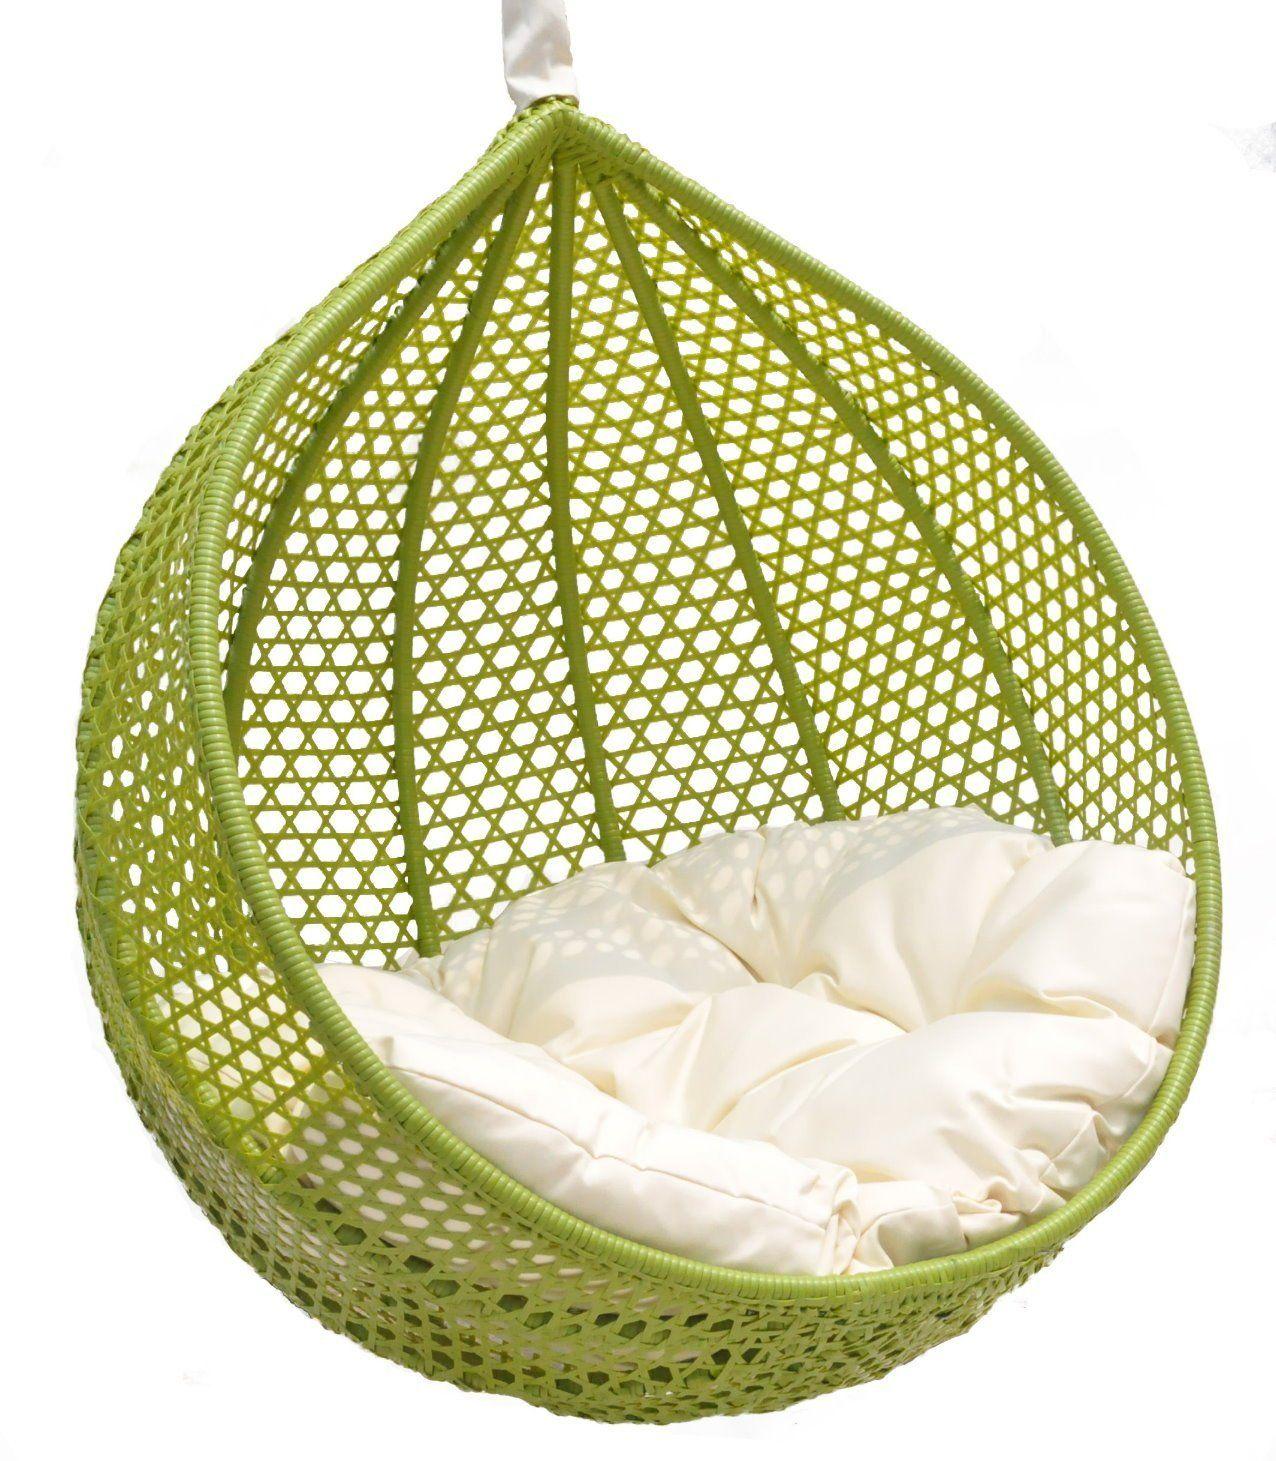 Furniture Sichuan Province Handmade Plastic Wicker Chair Outdoor